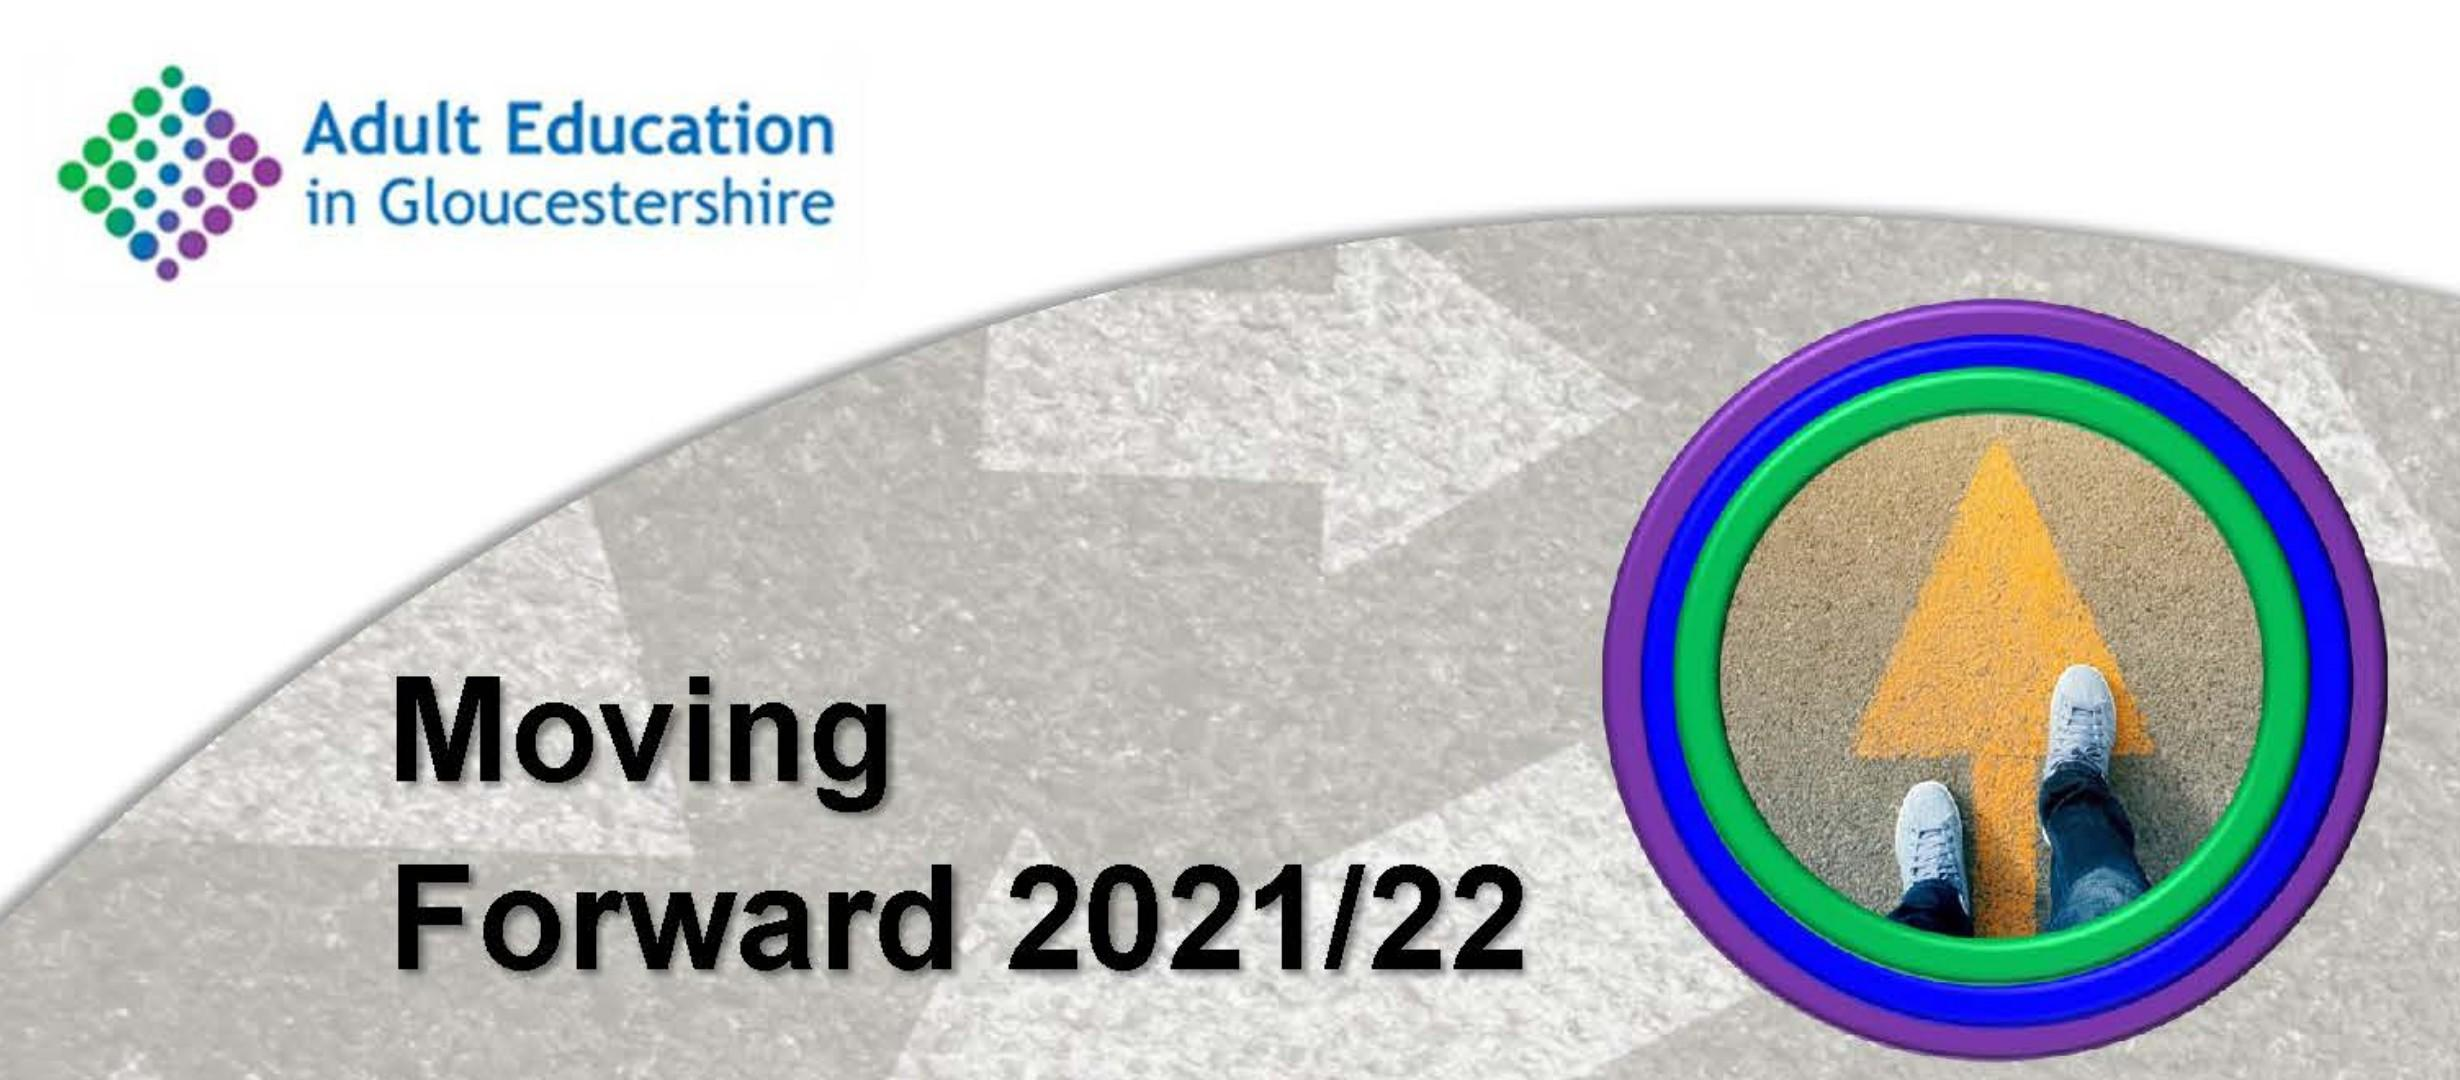 Moving Forward 2021/22, Stepping forward, adult education logo